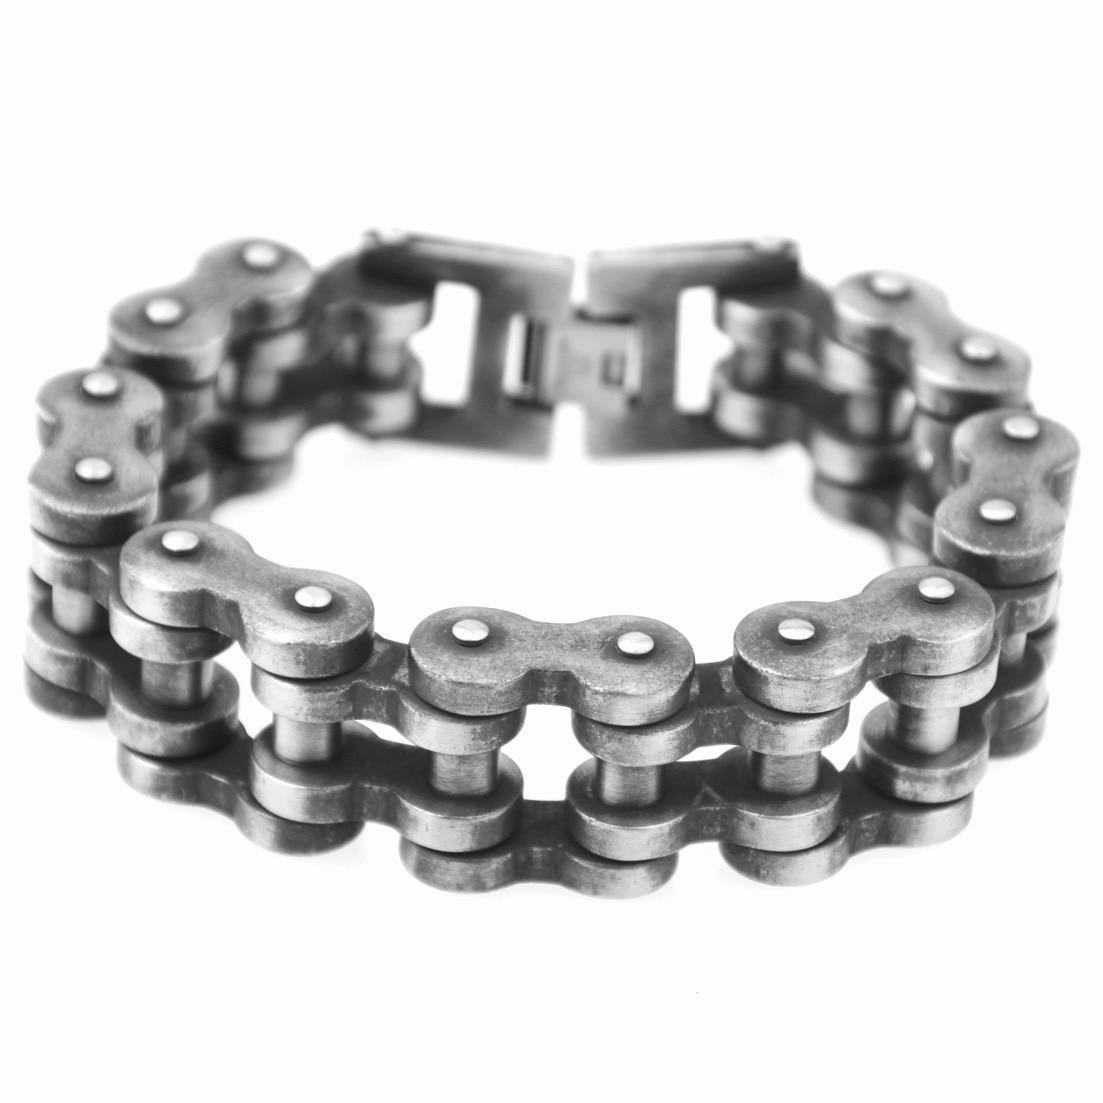 23.5mm Width Punk Retro 316L Stainless Steel Bracelet Men Biker Bicycle Motorcycle Chain Men's Bracelets & Bangles opk biker stainless steel men bracelet